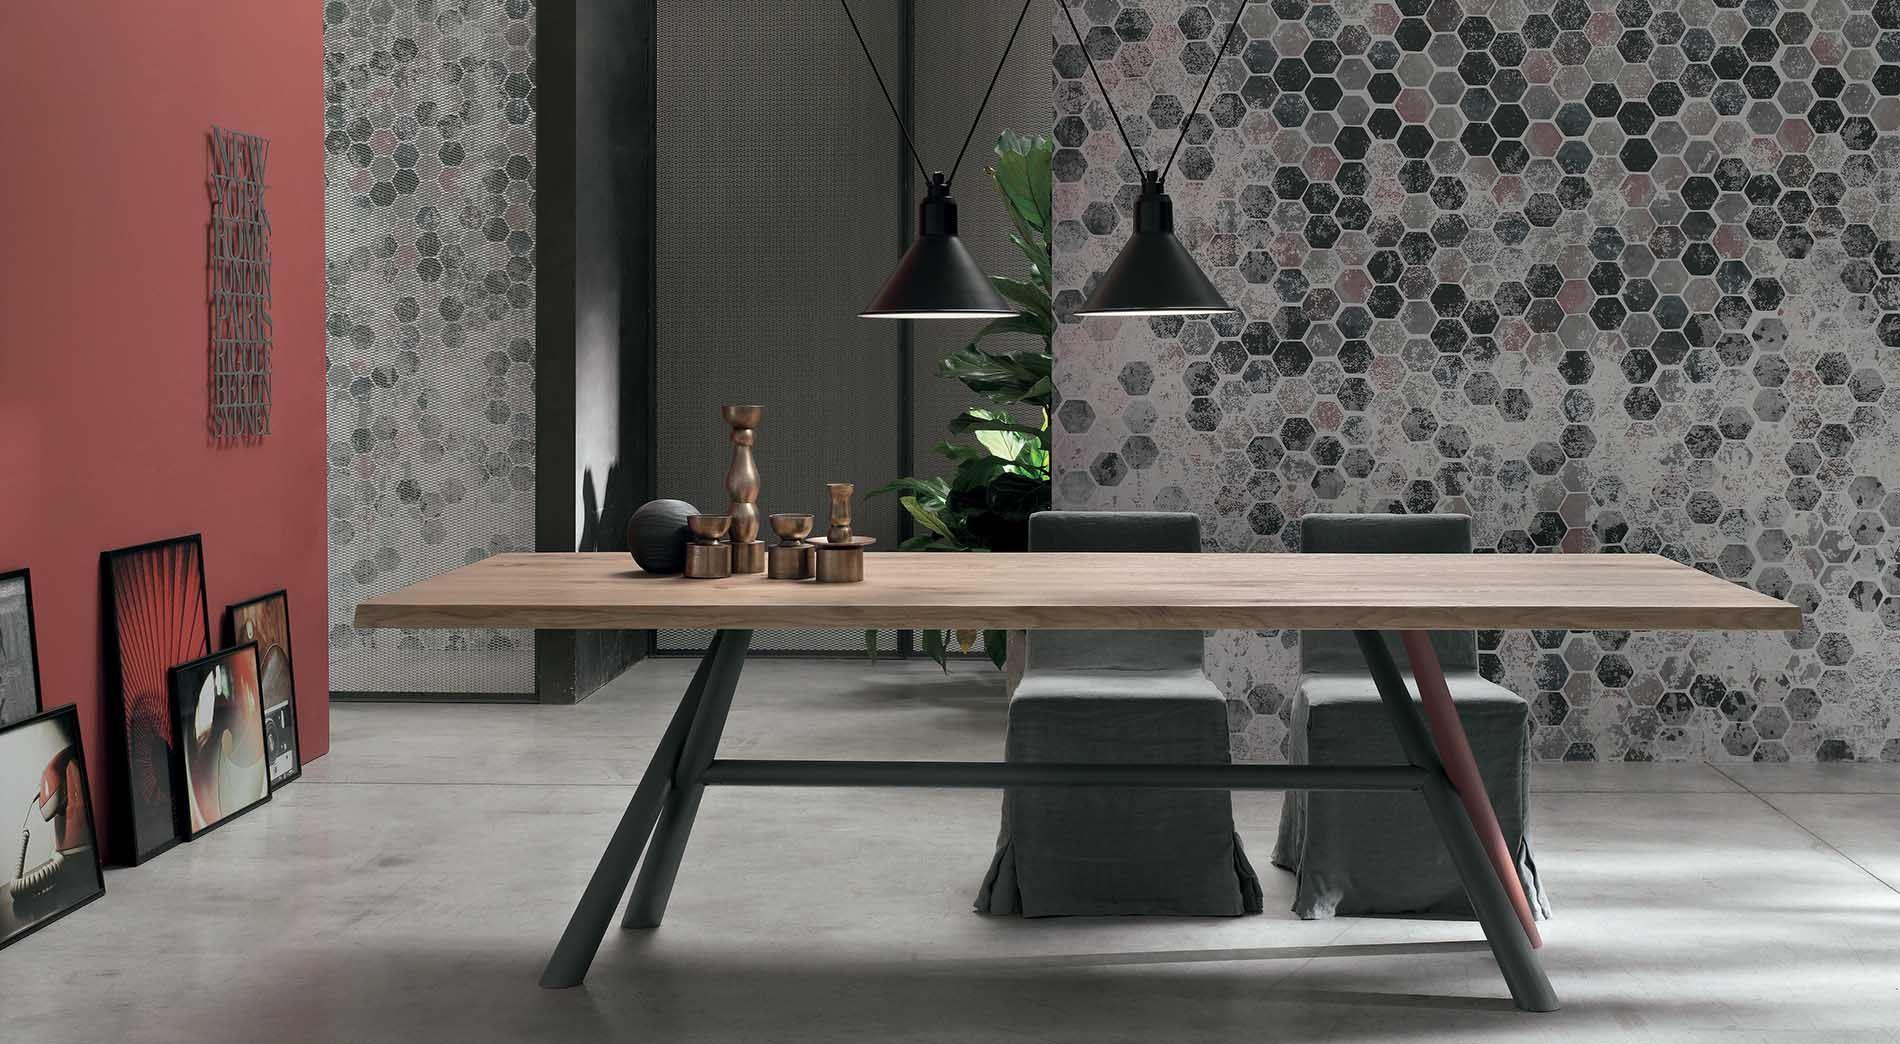 Outlet tavoli design a padova tavoli allungabili tavoli for Design outlet arredamento